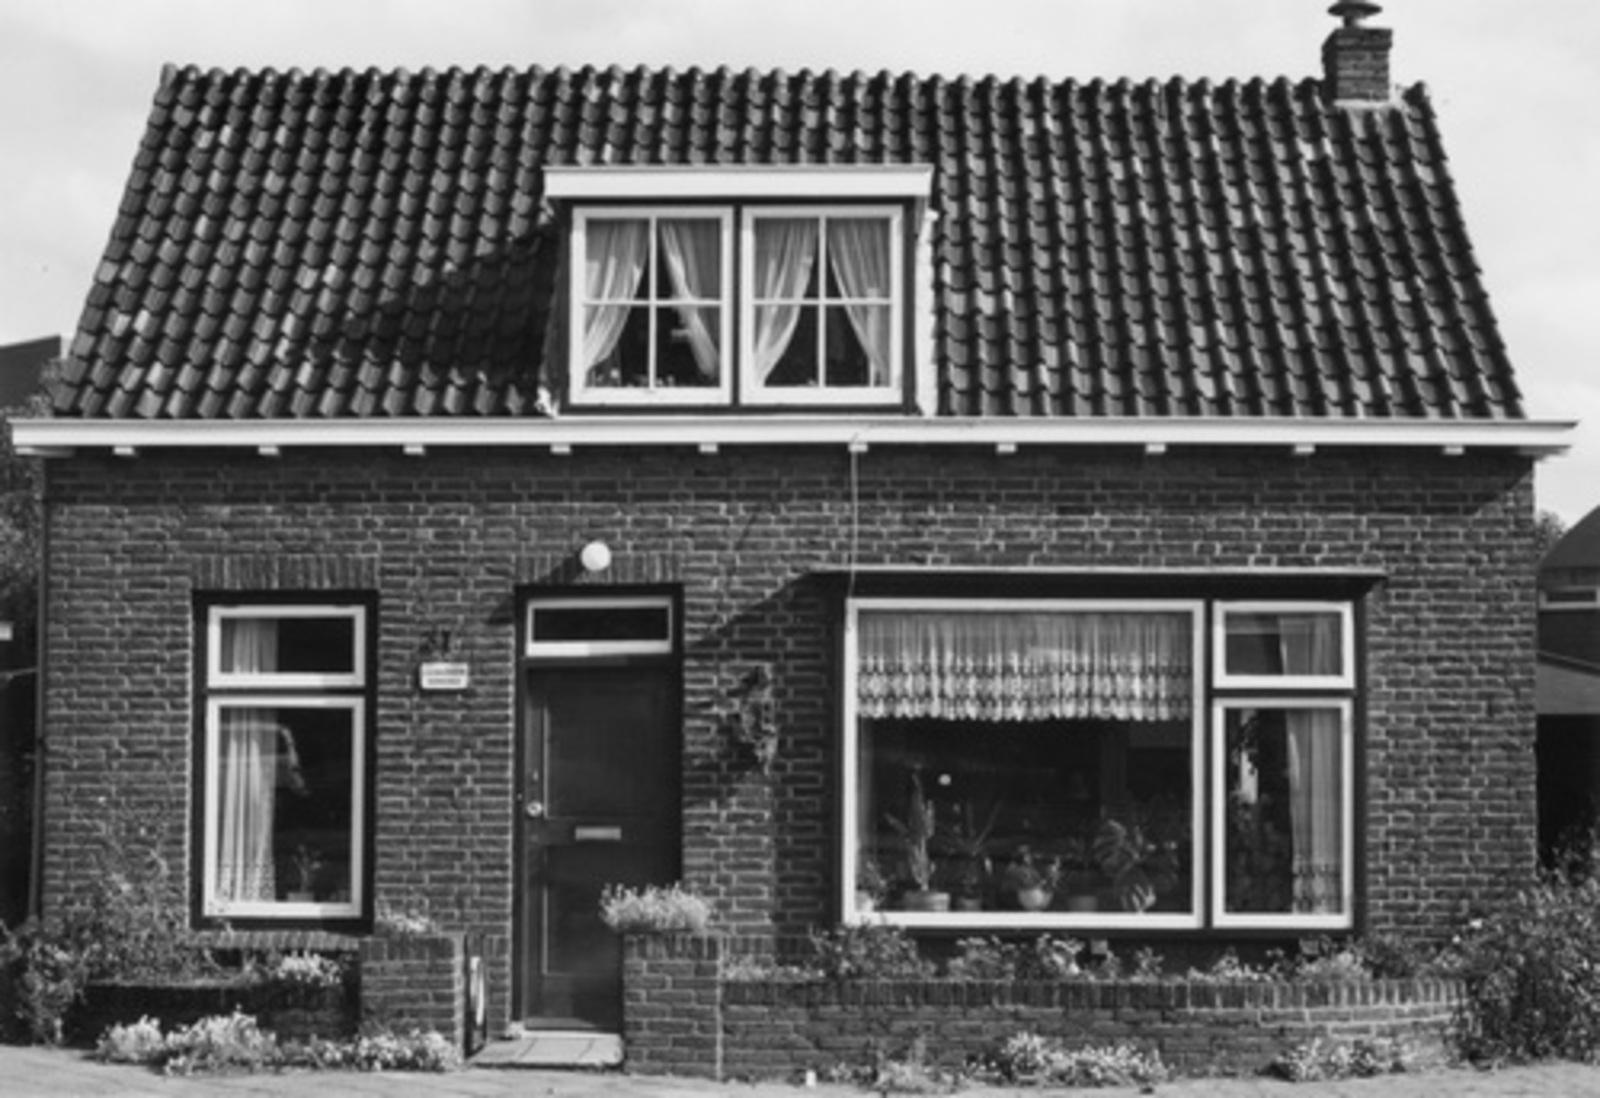 Marktplein N 0037 1978- Huize Aannemer Jan J den Ouden 01